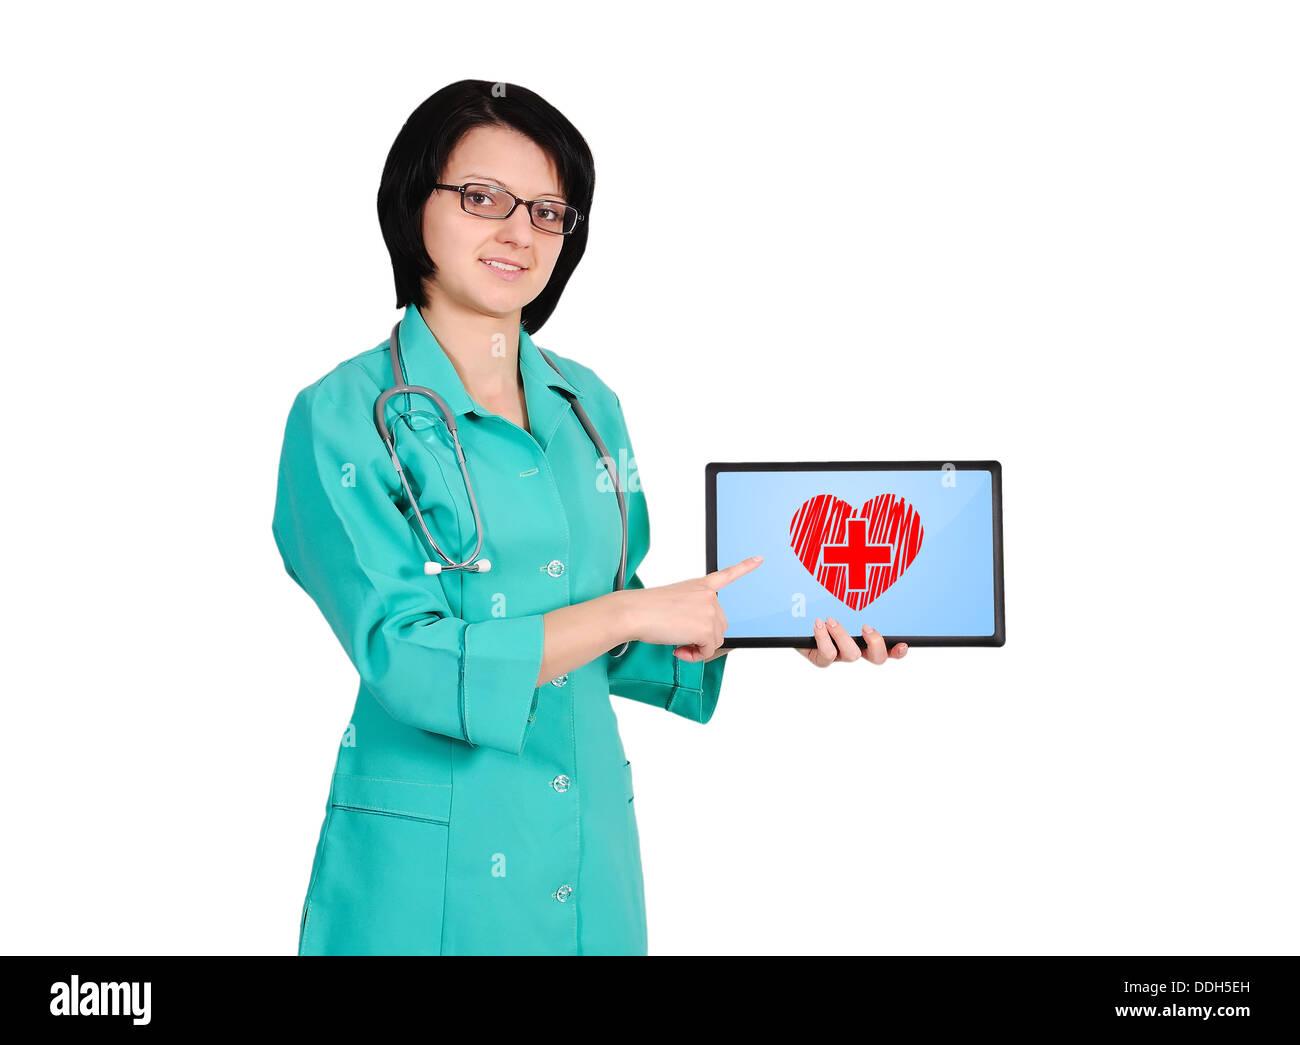 Heart symbol on tablet stock photo royalty free image 59999145 alamy heart symbol on tablet buycottarizona Choice Image